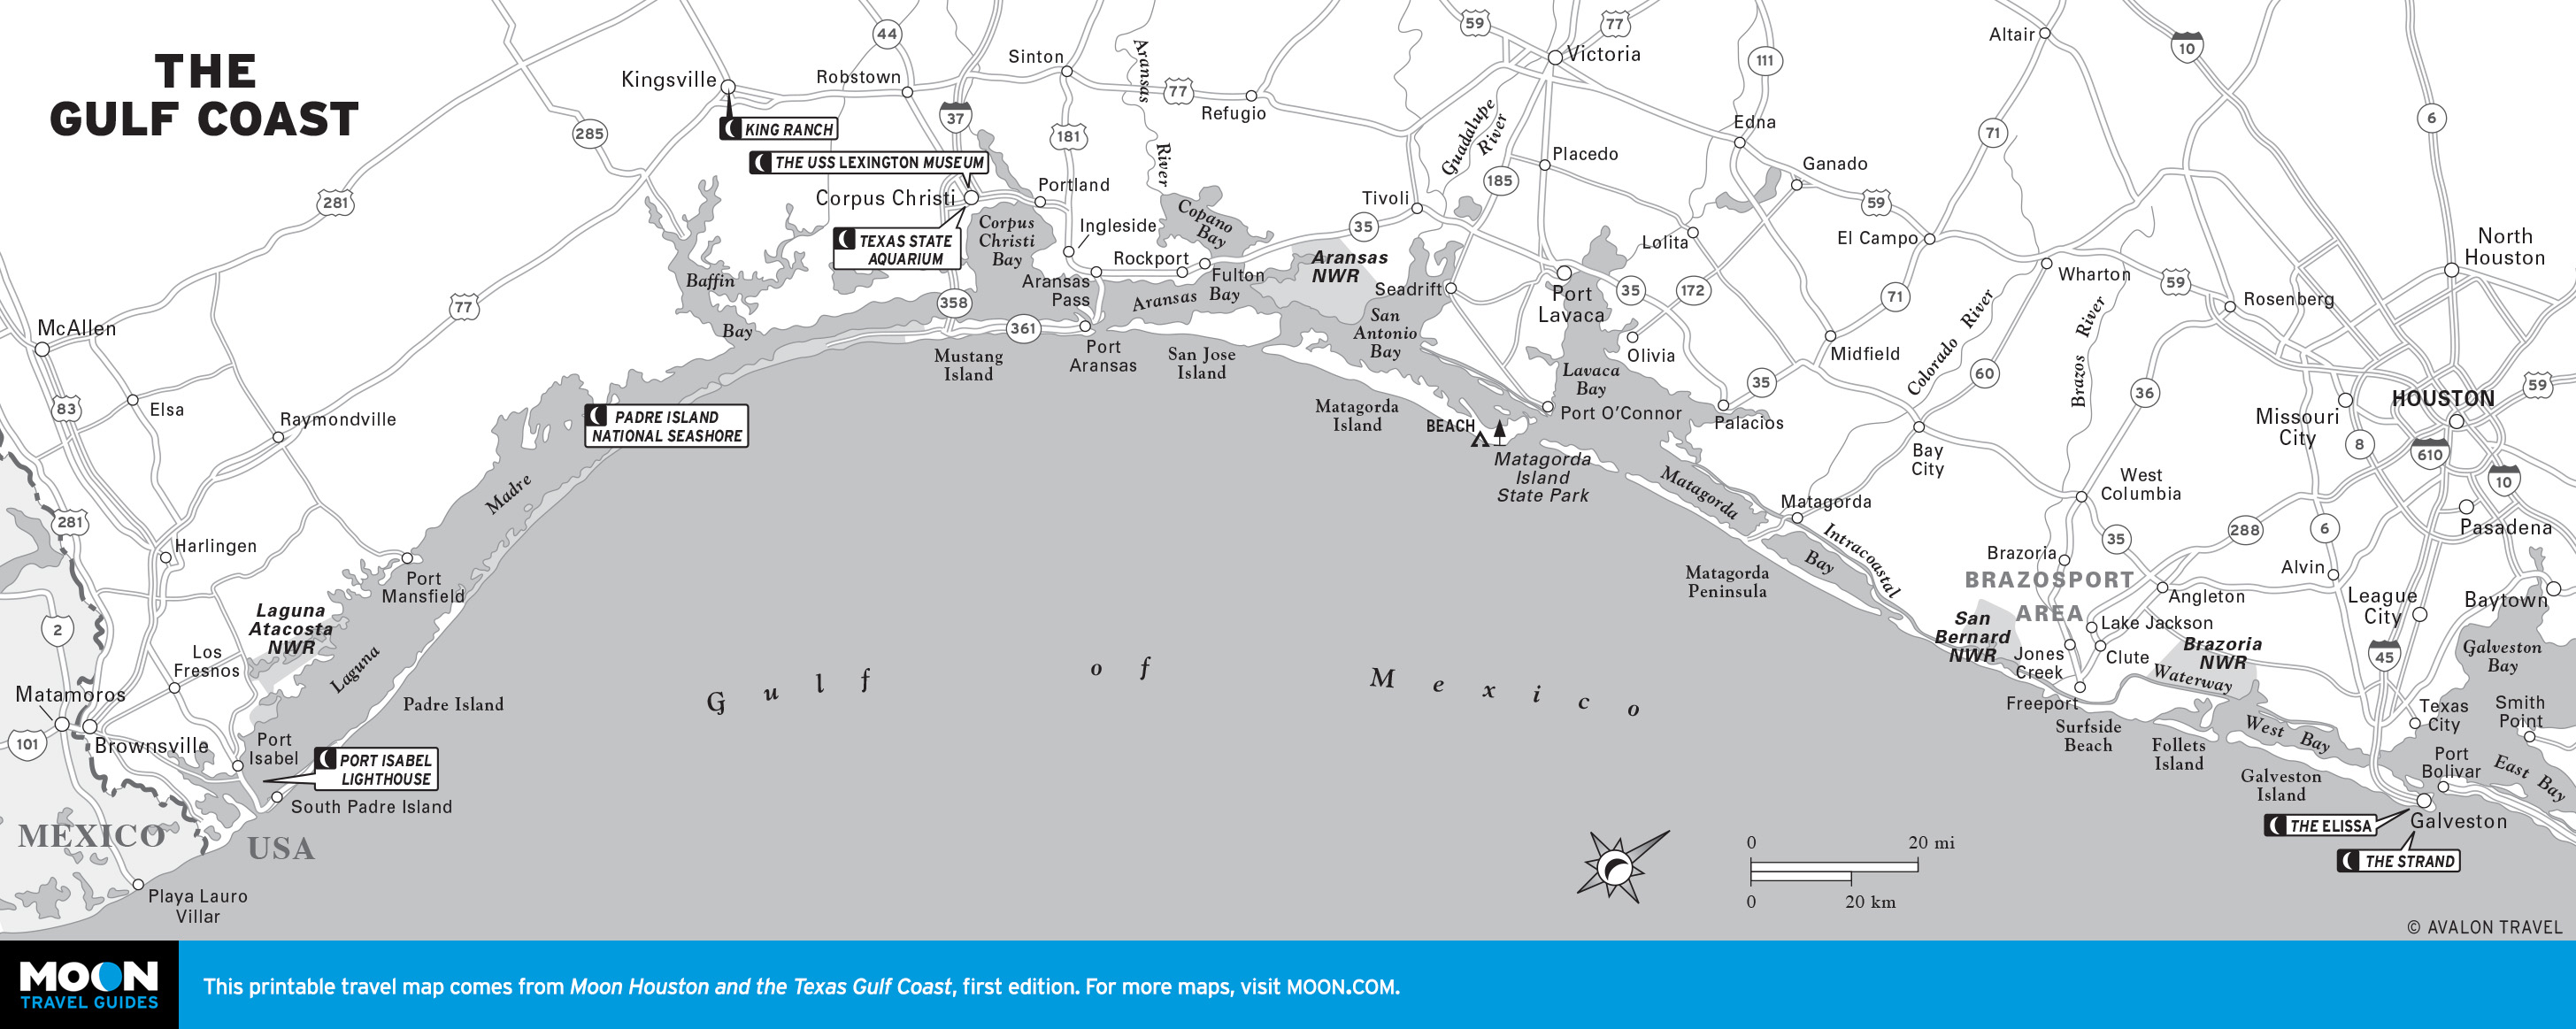 Map Of Texas Gulf Coast Beaches | Business Ideas 2013 - Map Of Texas Coastline